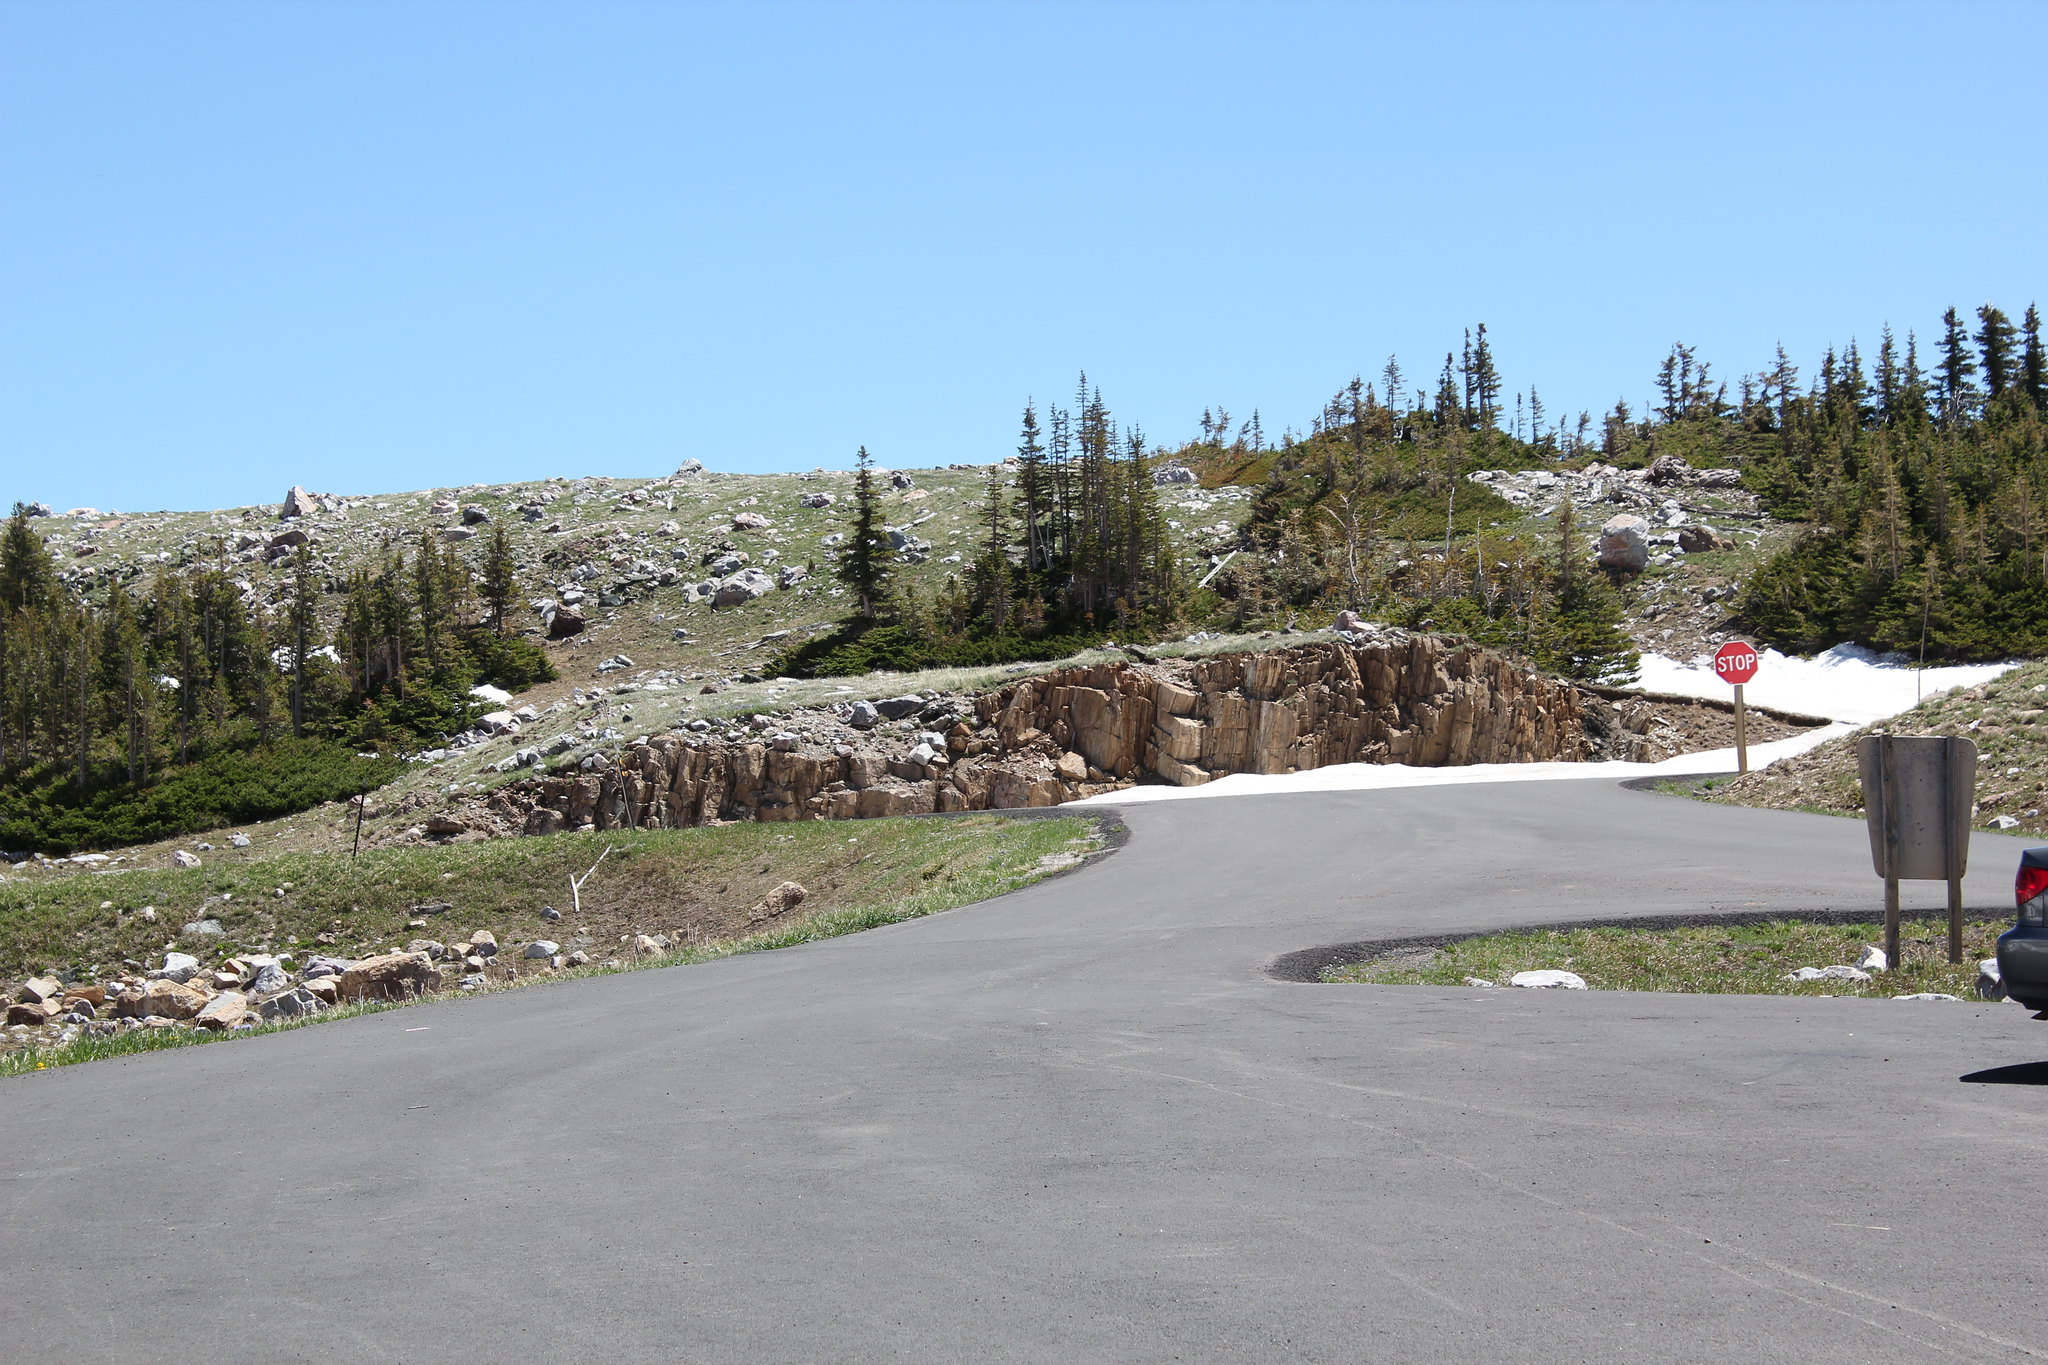 HSI 2016 Snowy Range 171